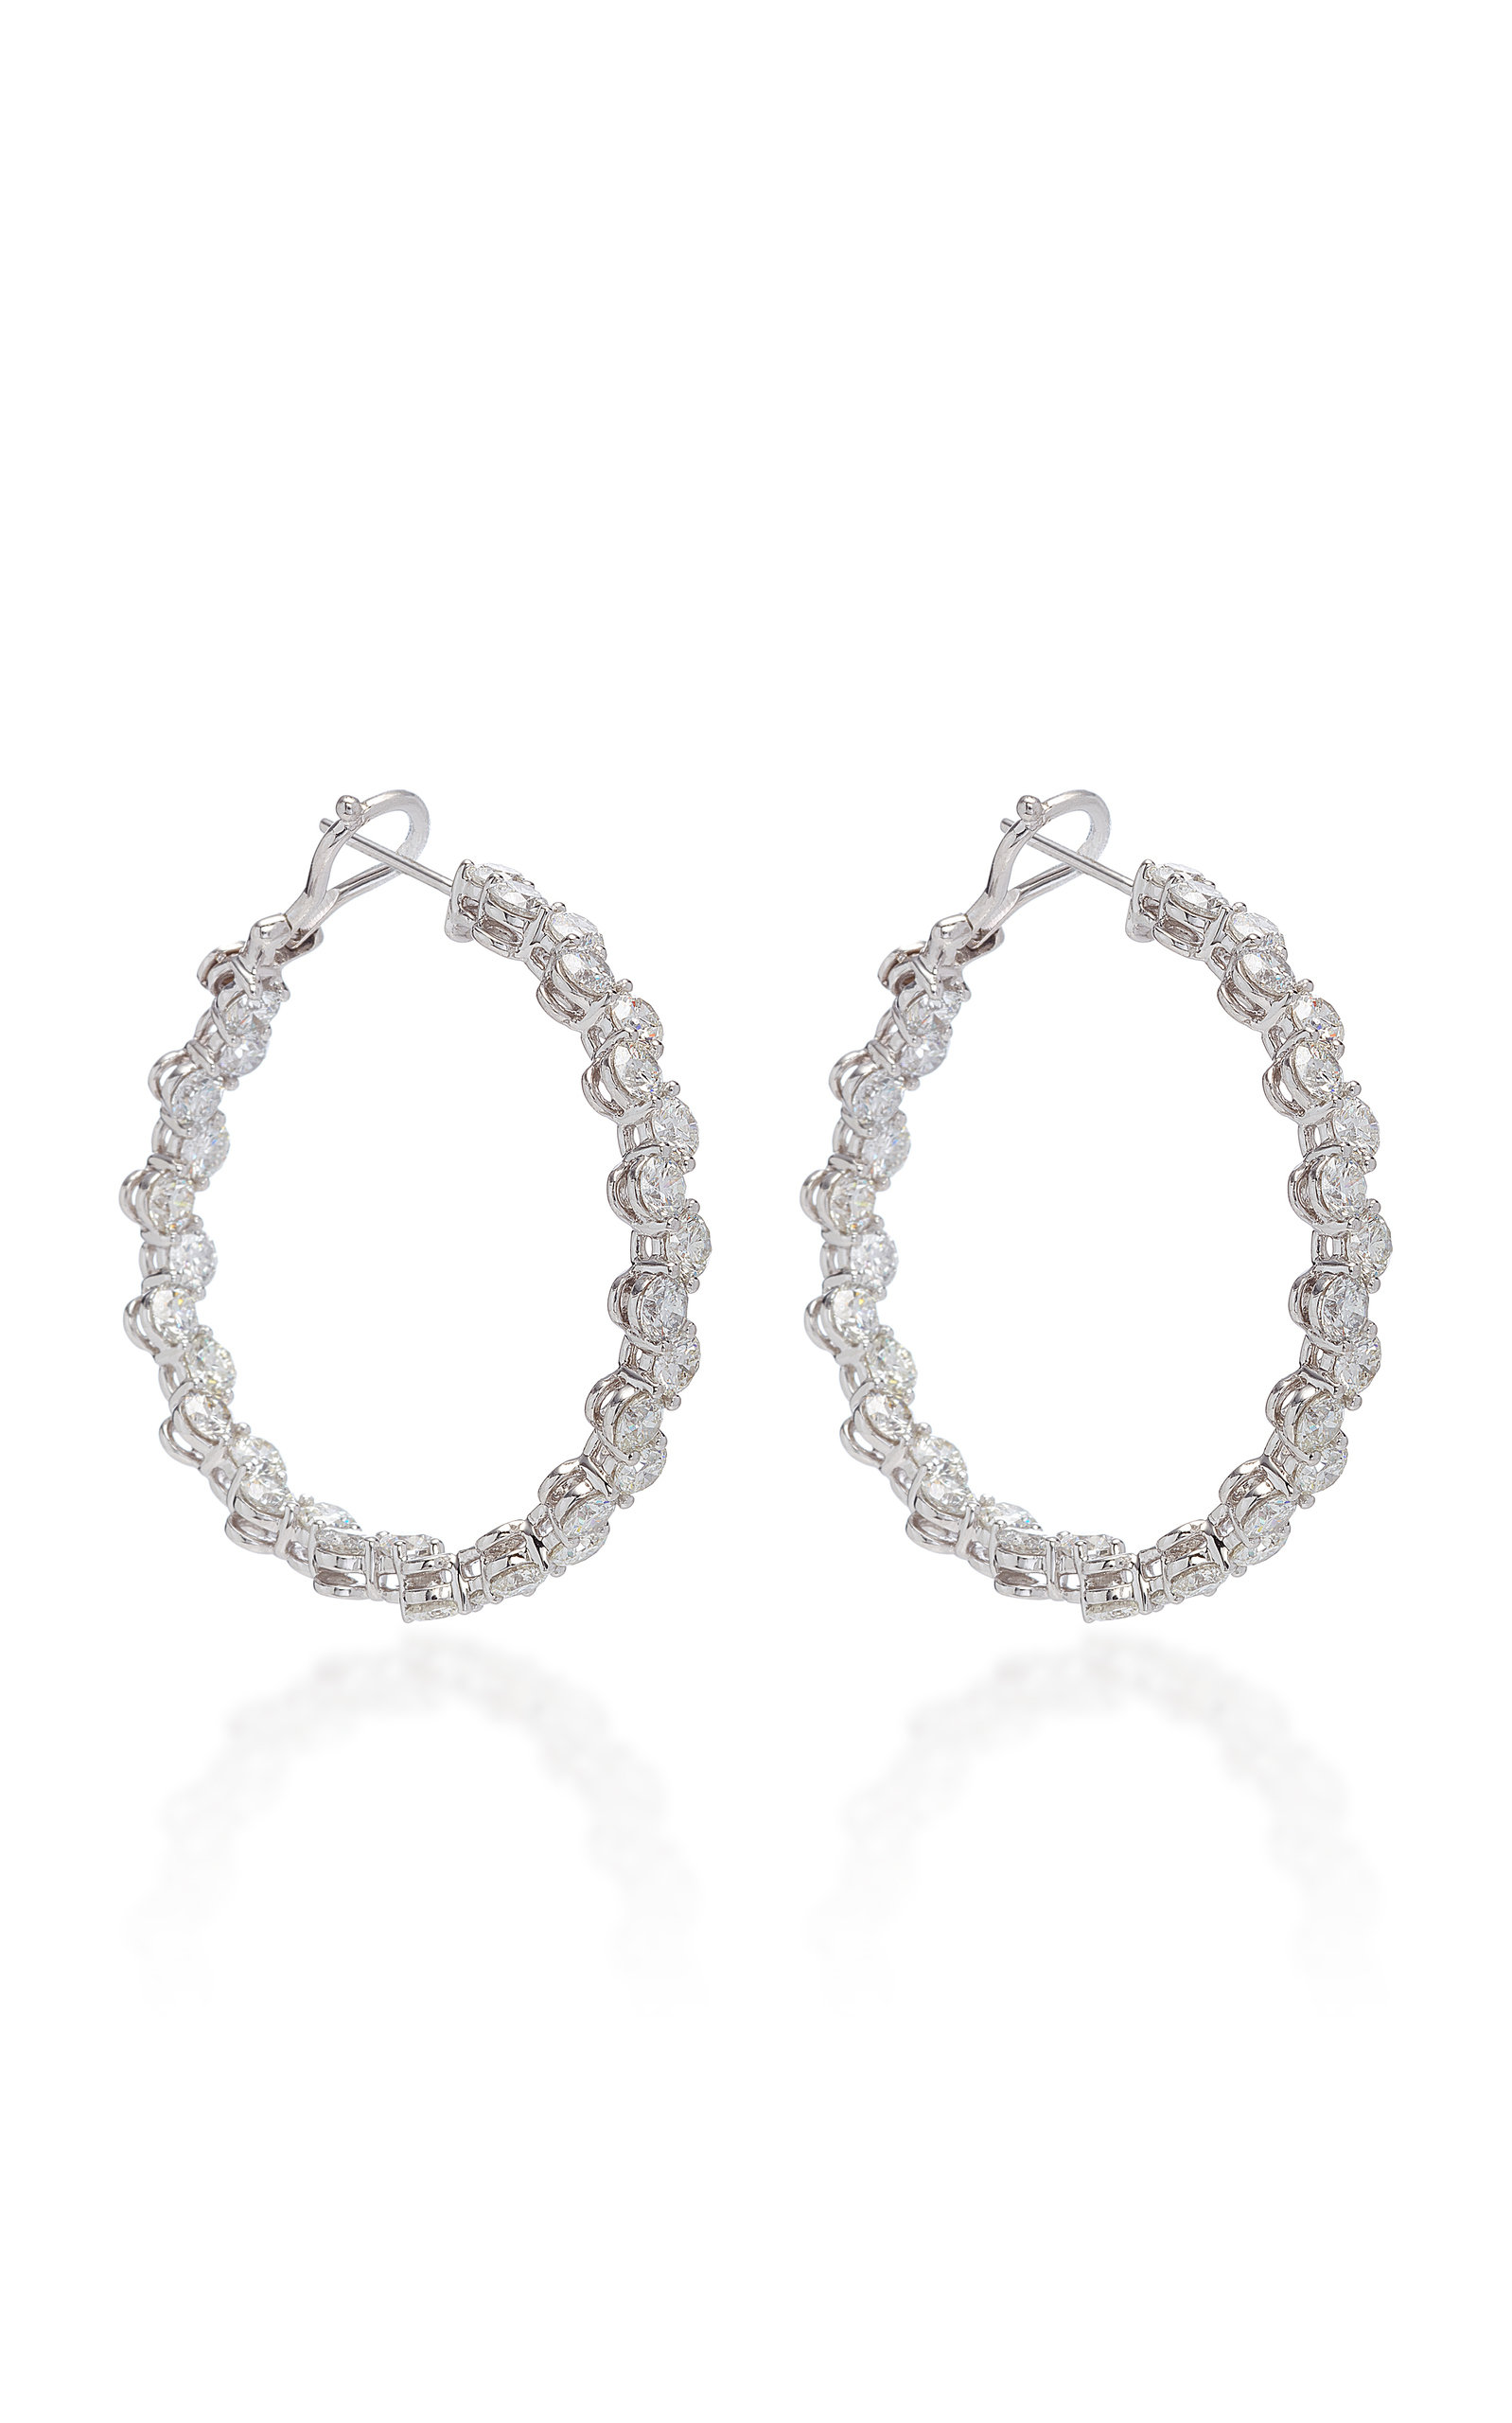 SABBADINI White Gold Diamond Hoop Earrings